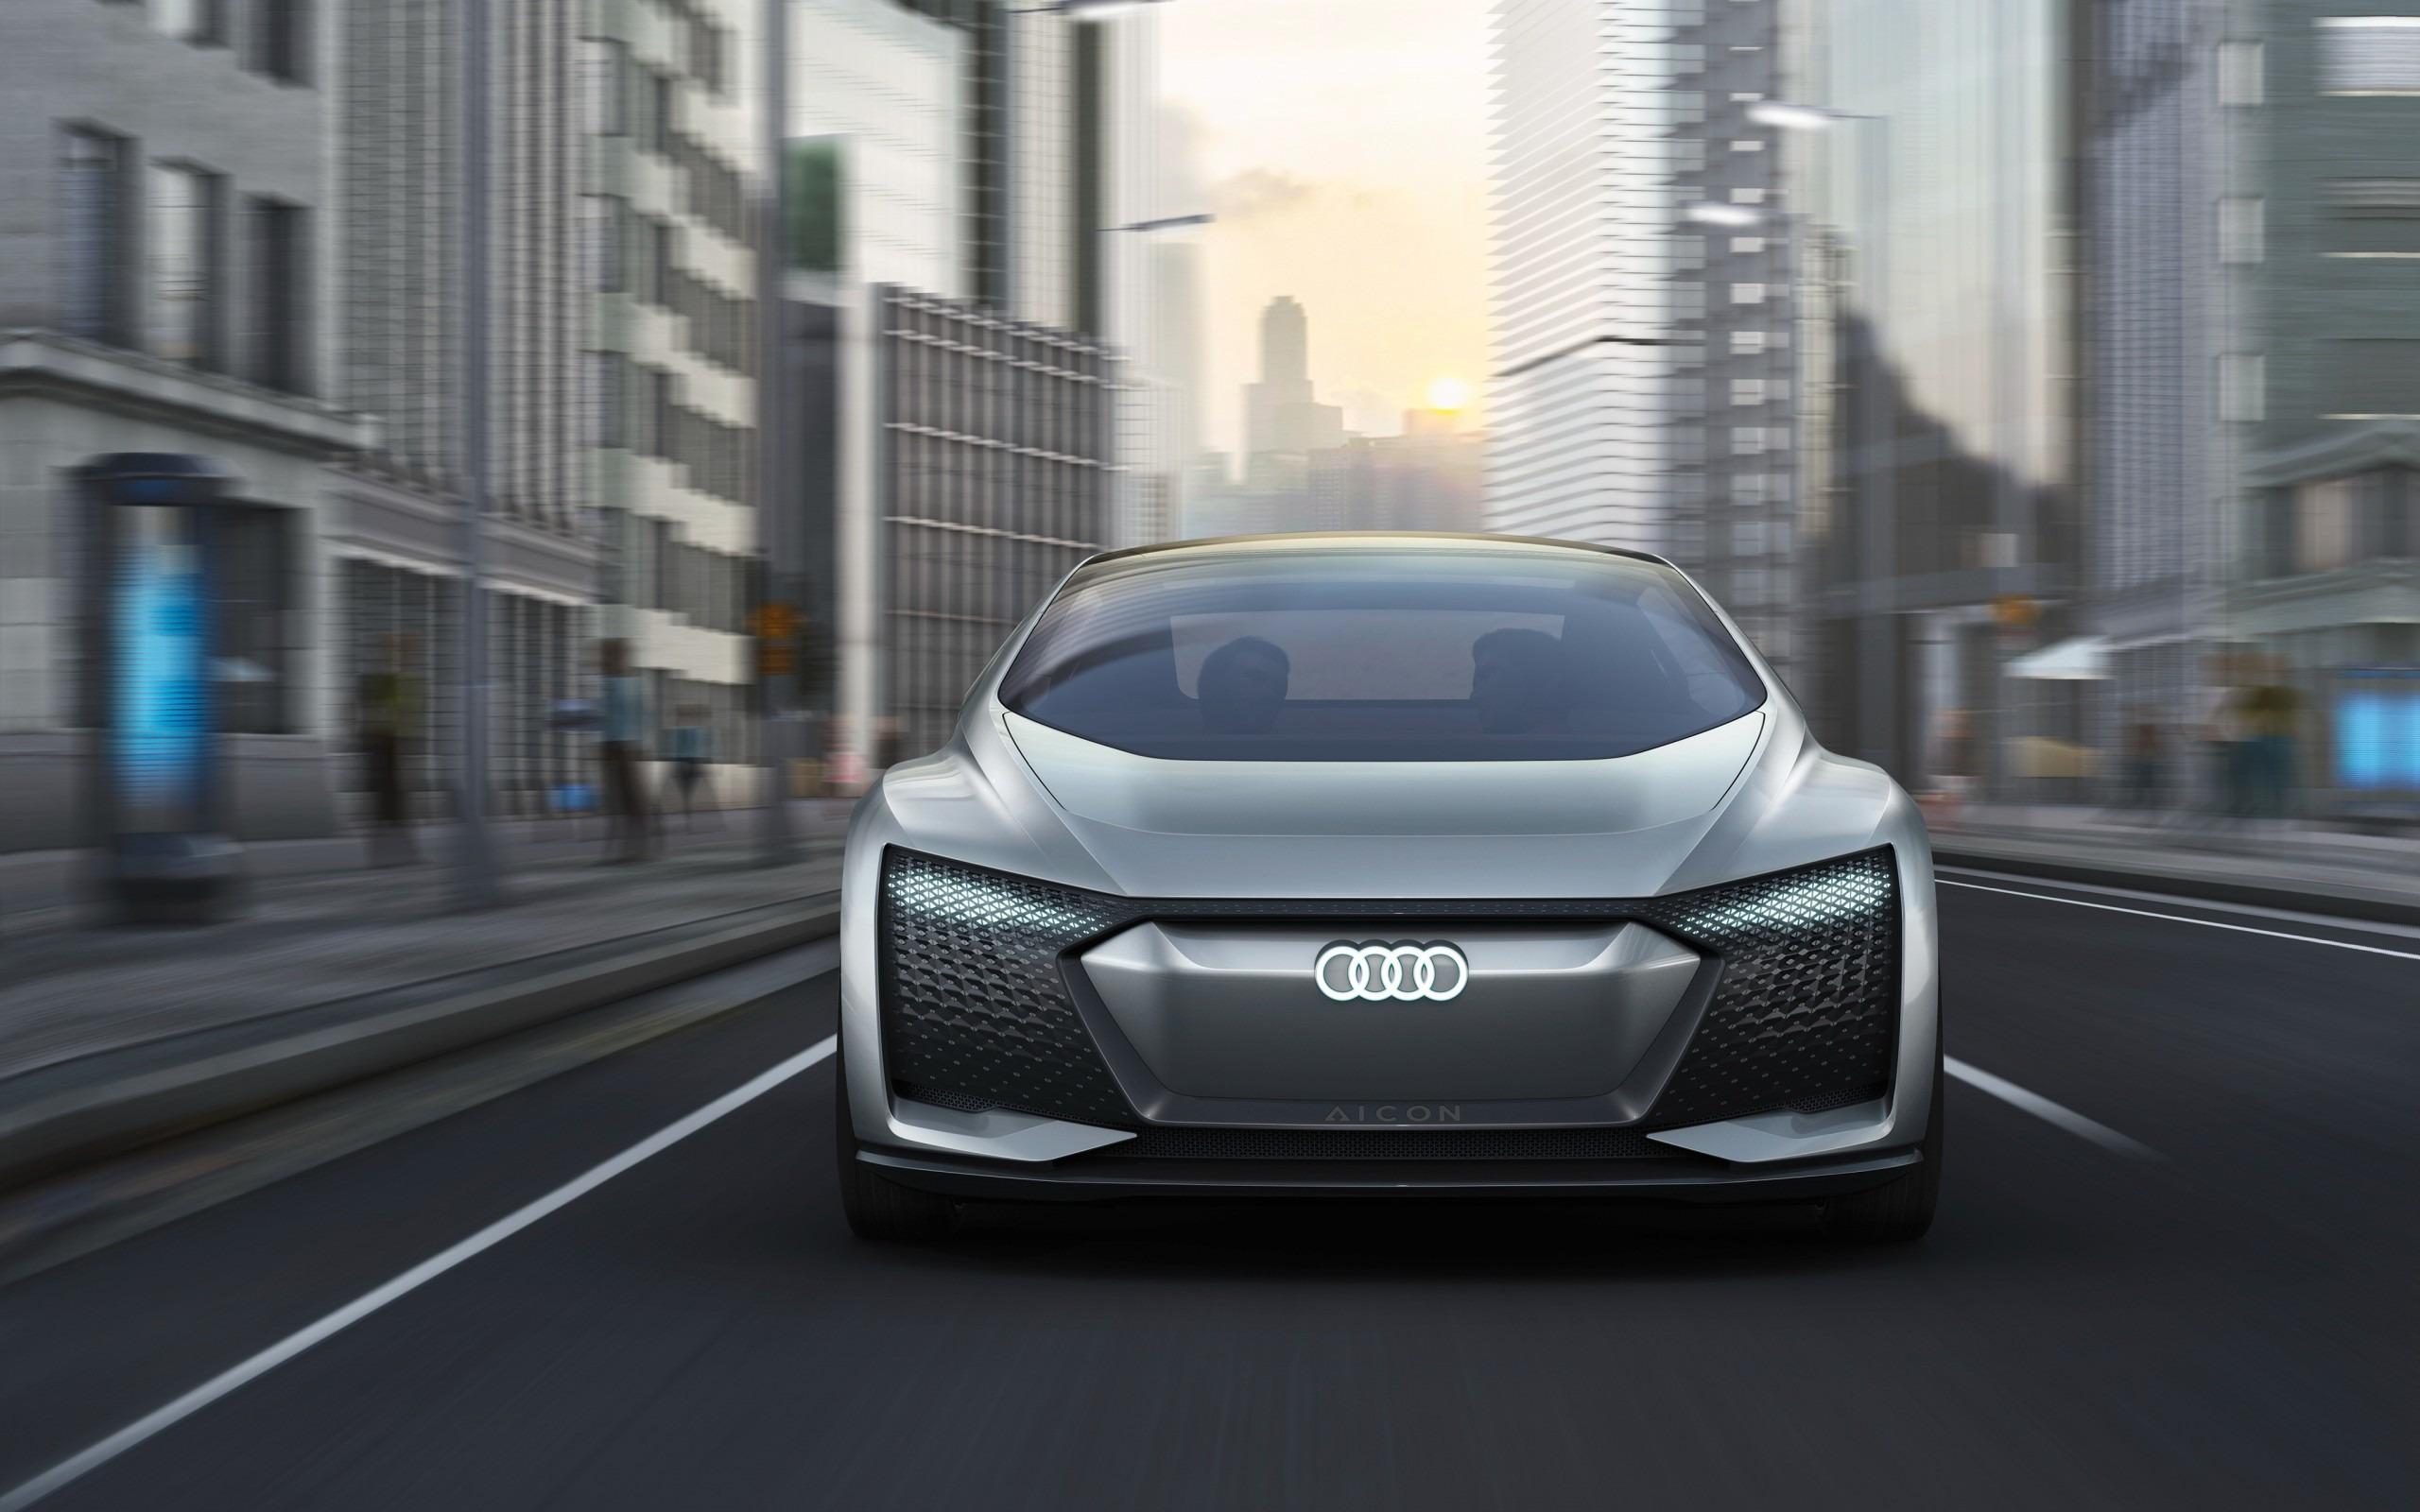 Audi Aicon Frankfurt Car Poster Wallpaper X